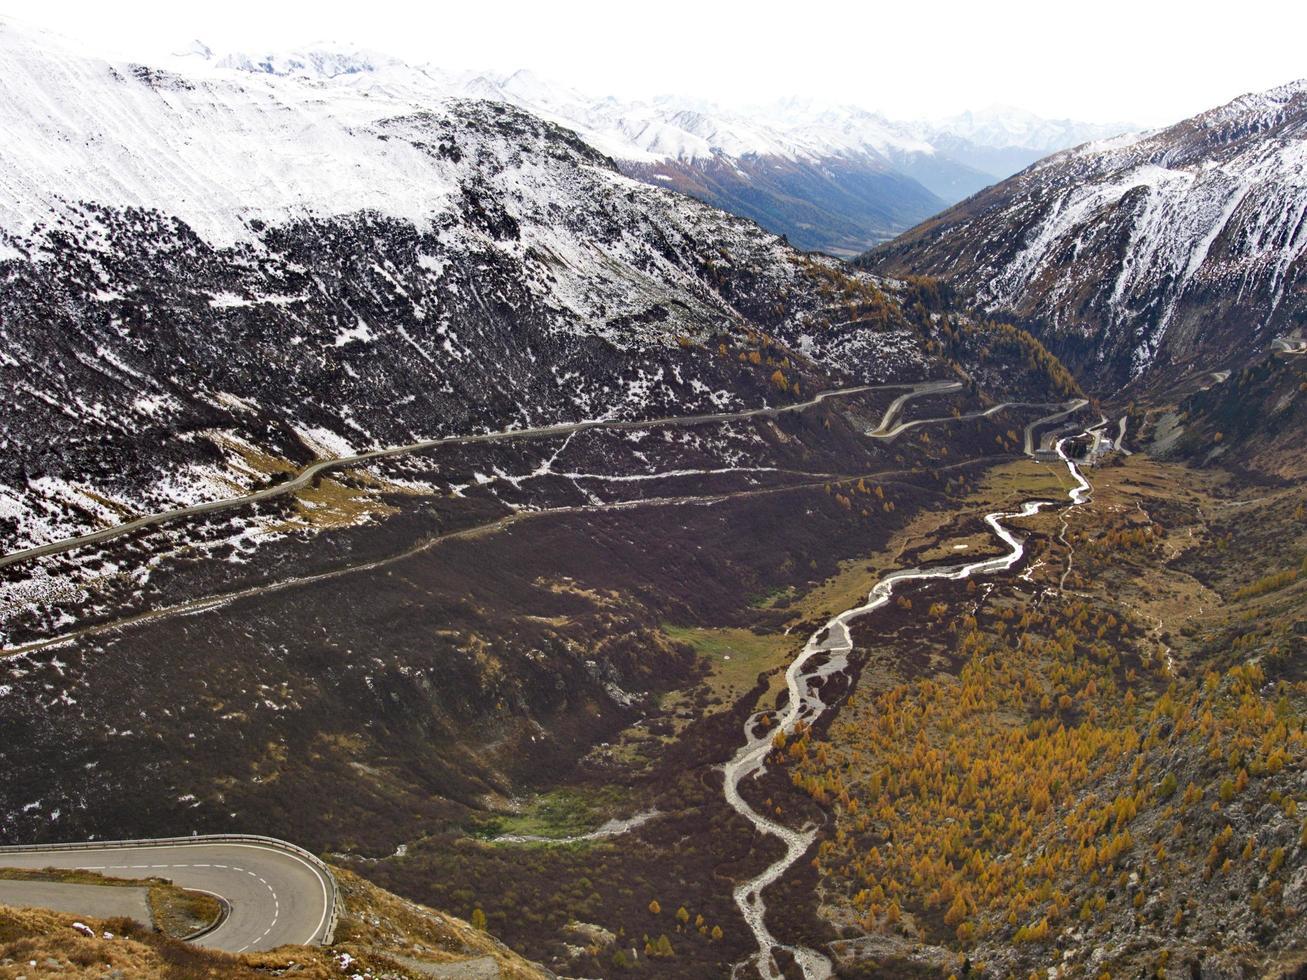 vista aérea de montañas nevadas foto